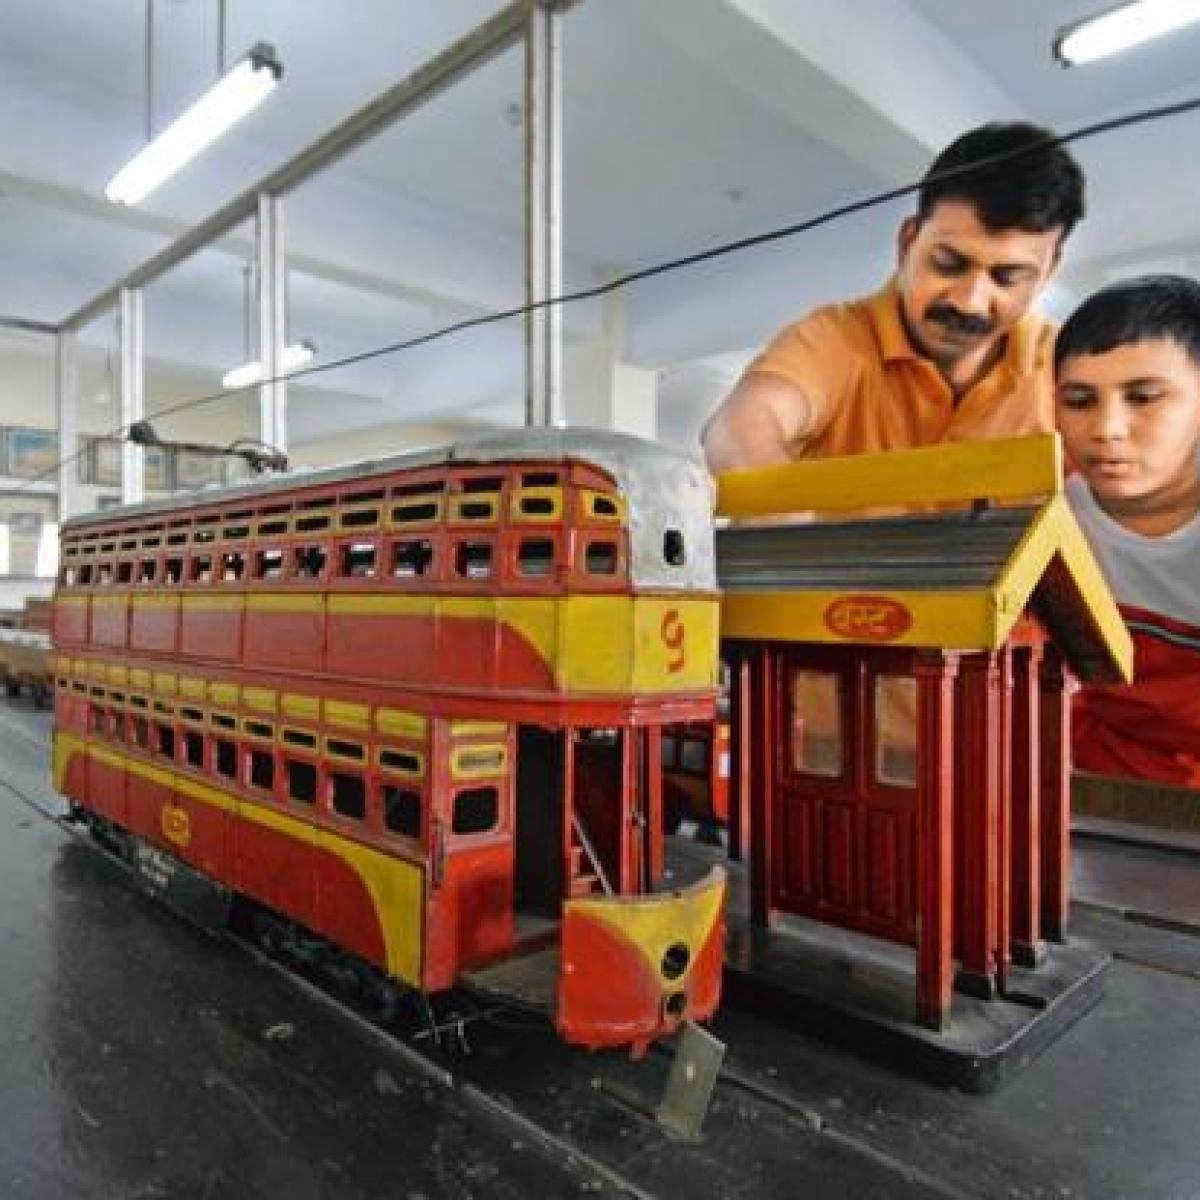 Mumbai: City delays inauguration of restored heritage tram amid Covid-19 scare